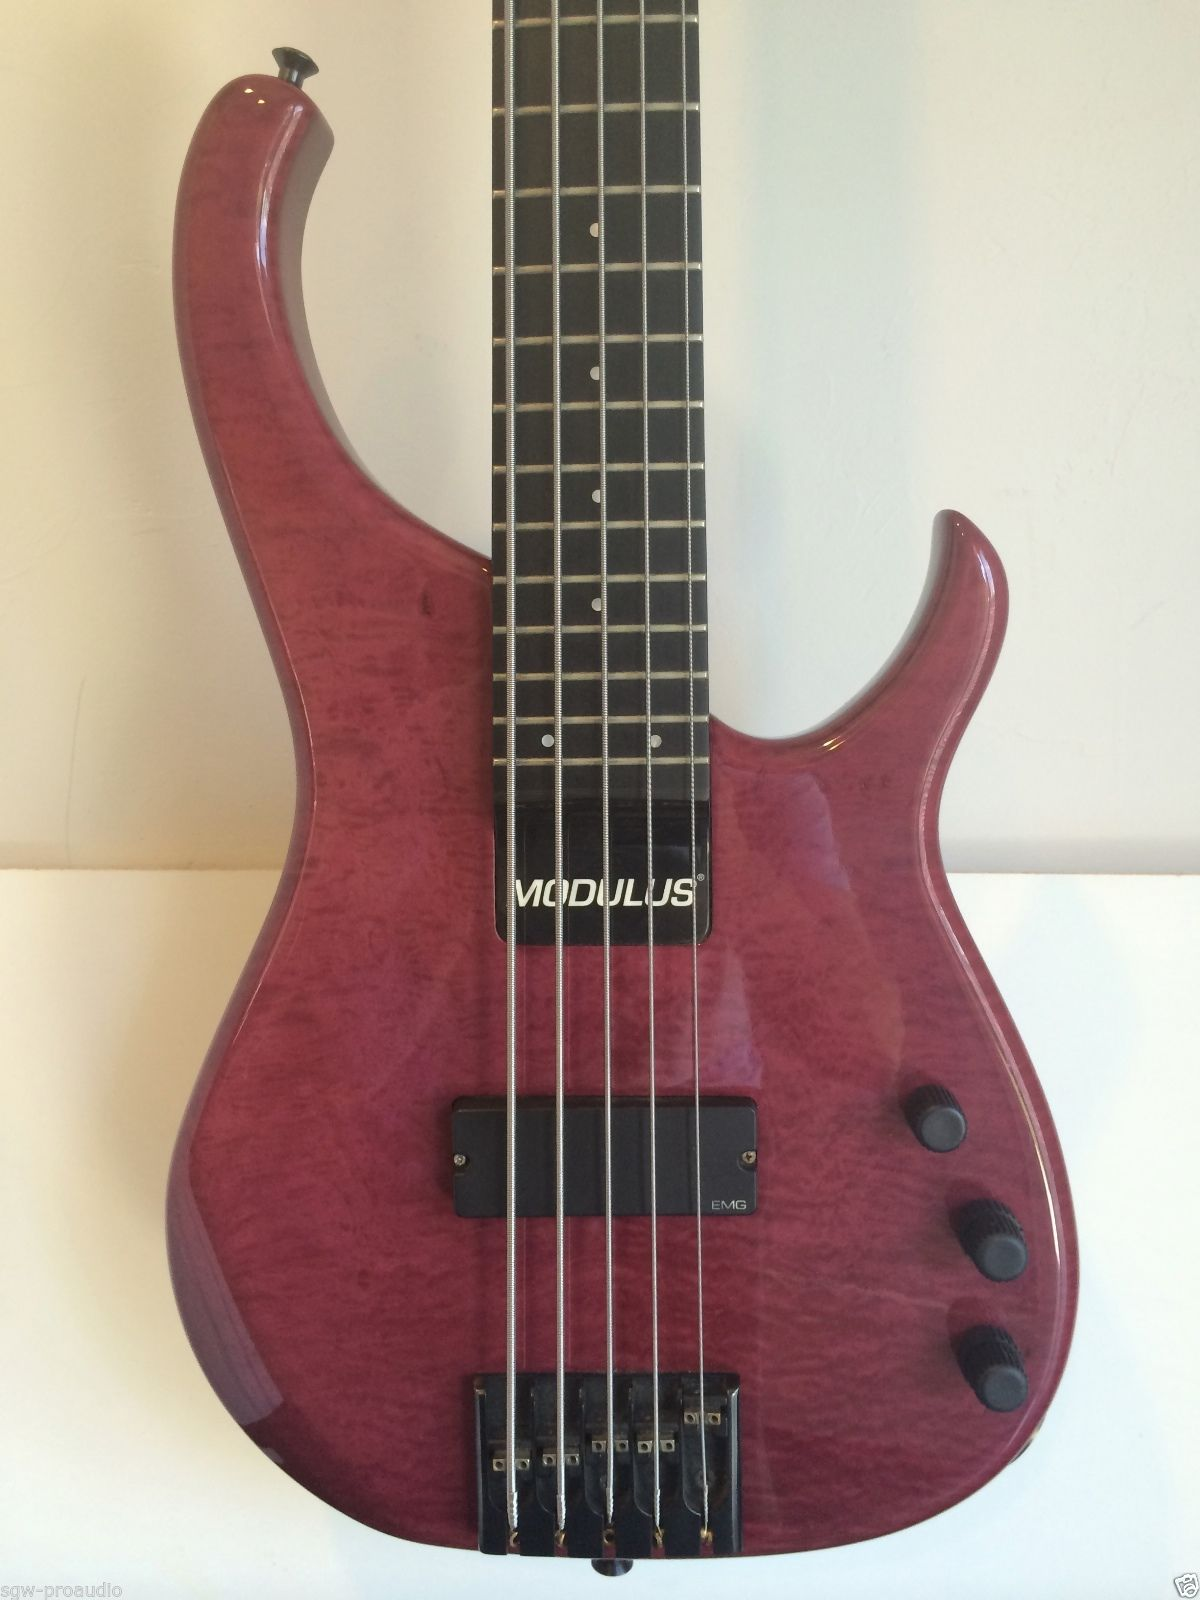 modulus quantum 5 sweetspot bass guitar sweet spot five string with hard case. Black Bedroom Furniture Sets. Home Design Ideas